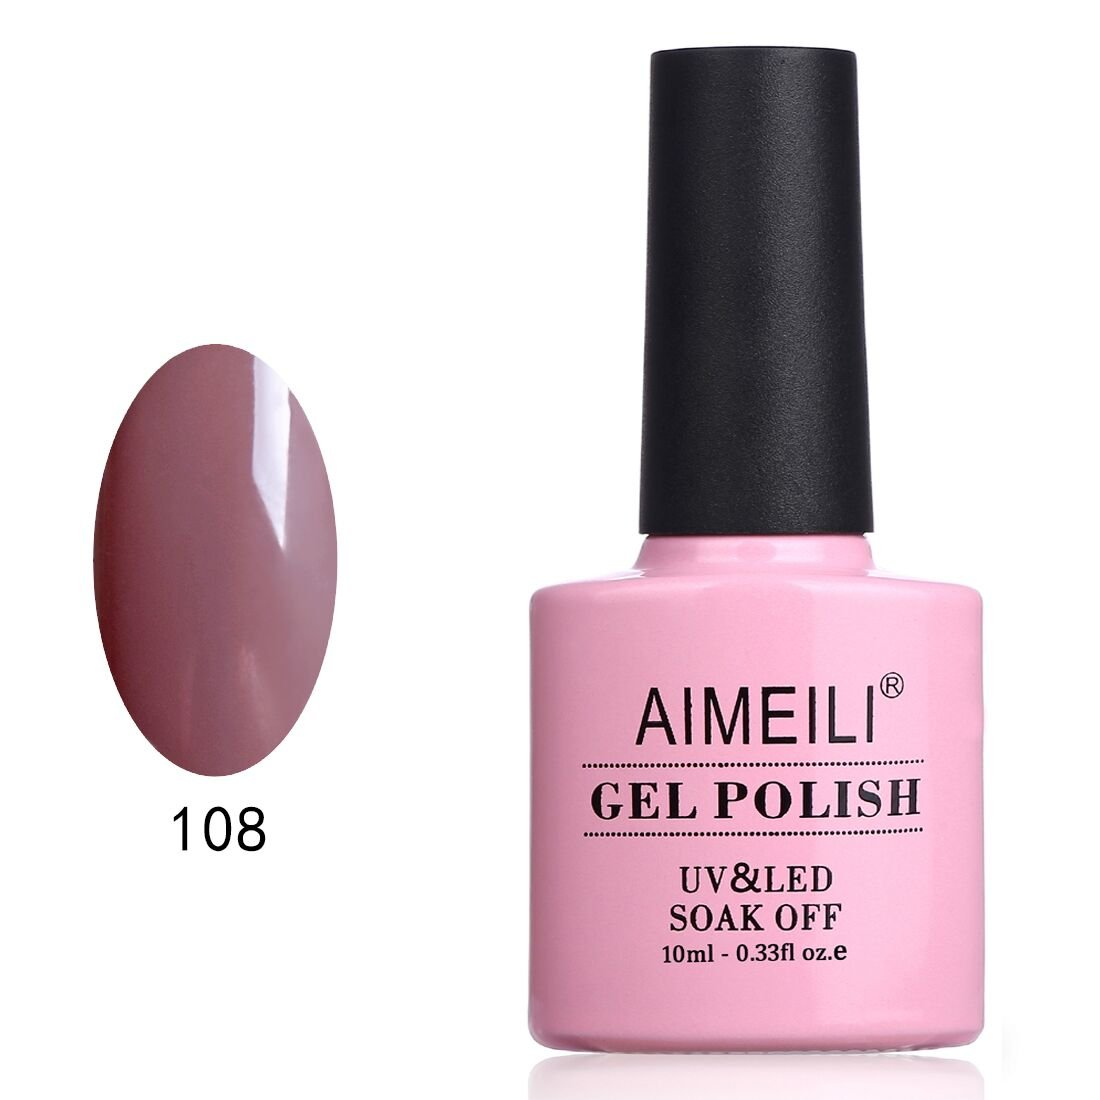 AIMEILI Soak Off UV LED Gel Nail Polish - Brown Lilies (108) 10ml